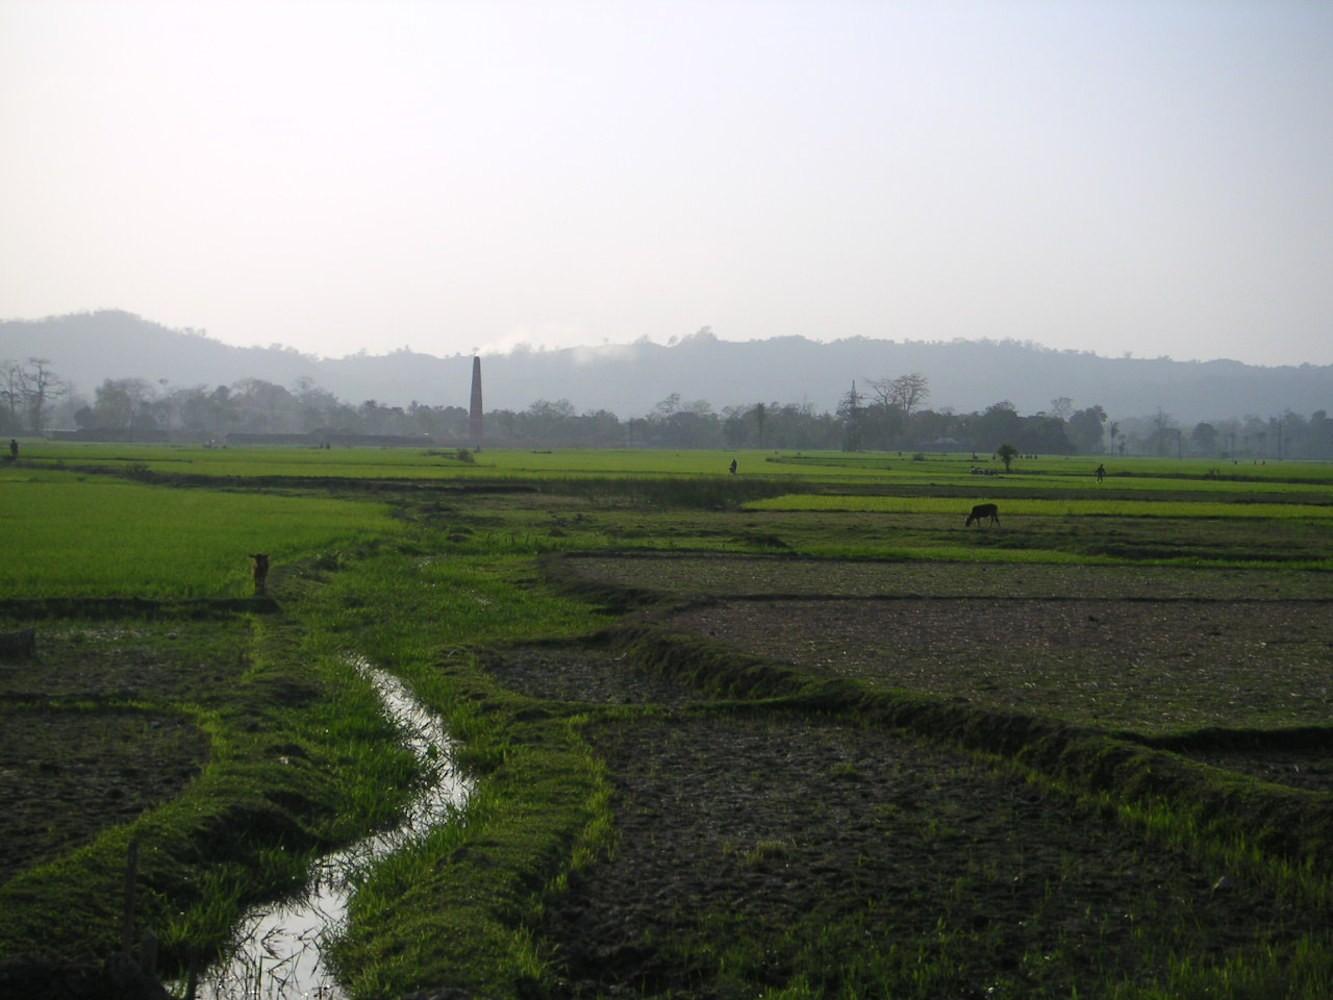 Land for Sale In Kopargaon